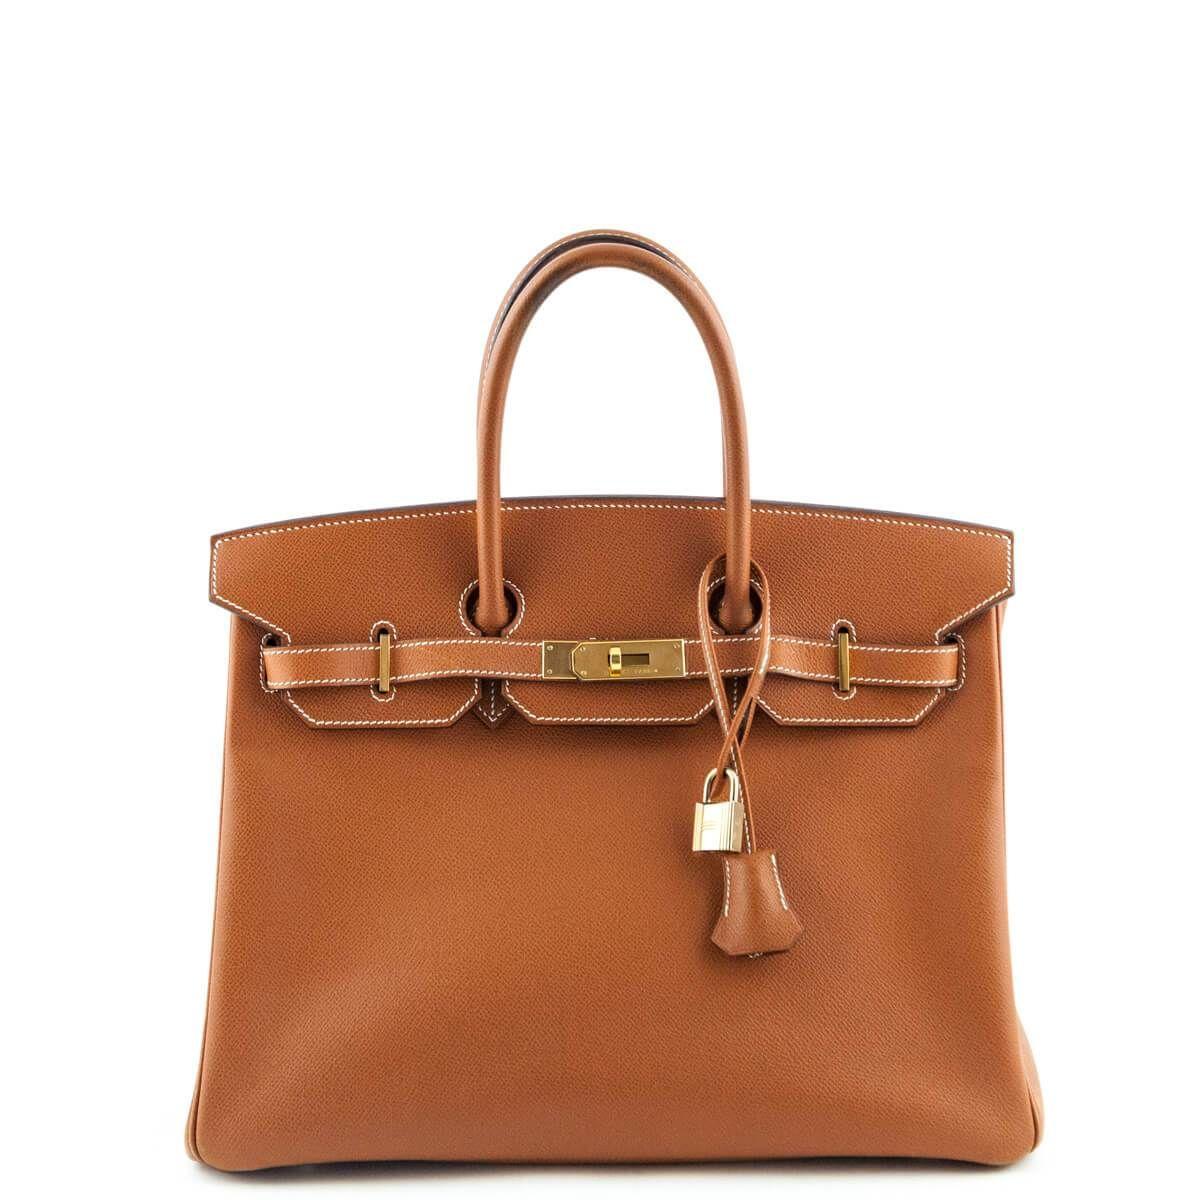 Hermes Potiron Epsom Birkin 35 Authentic Hermes Birkin Canada 8500cad Berkin Bag Bags Birkin